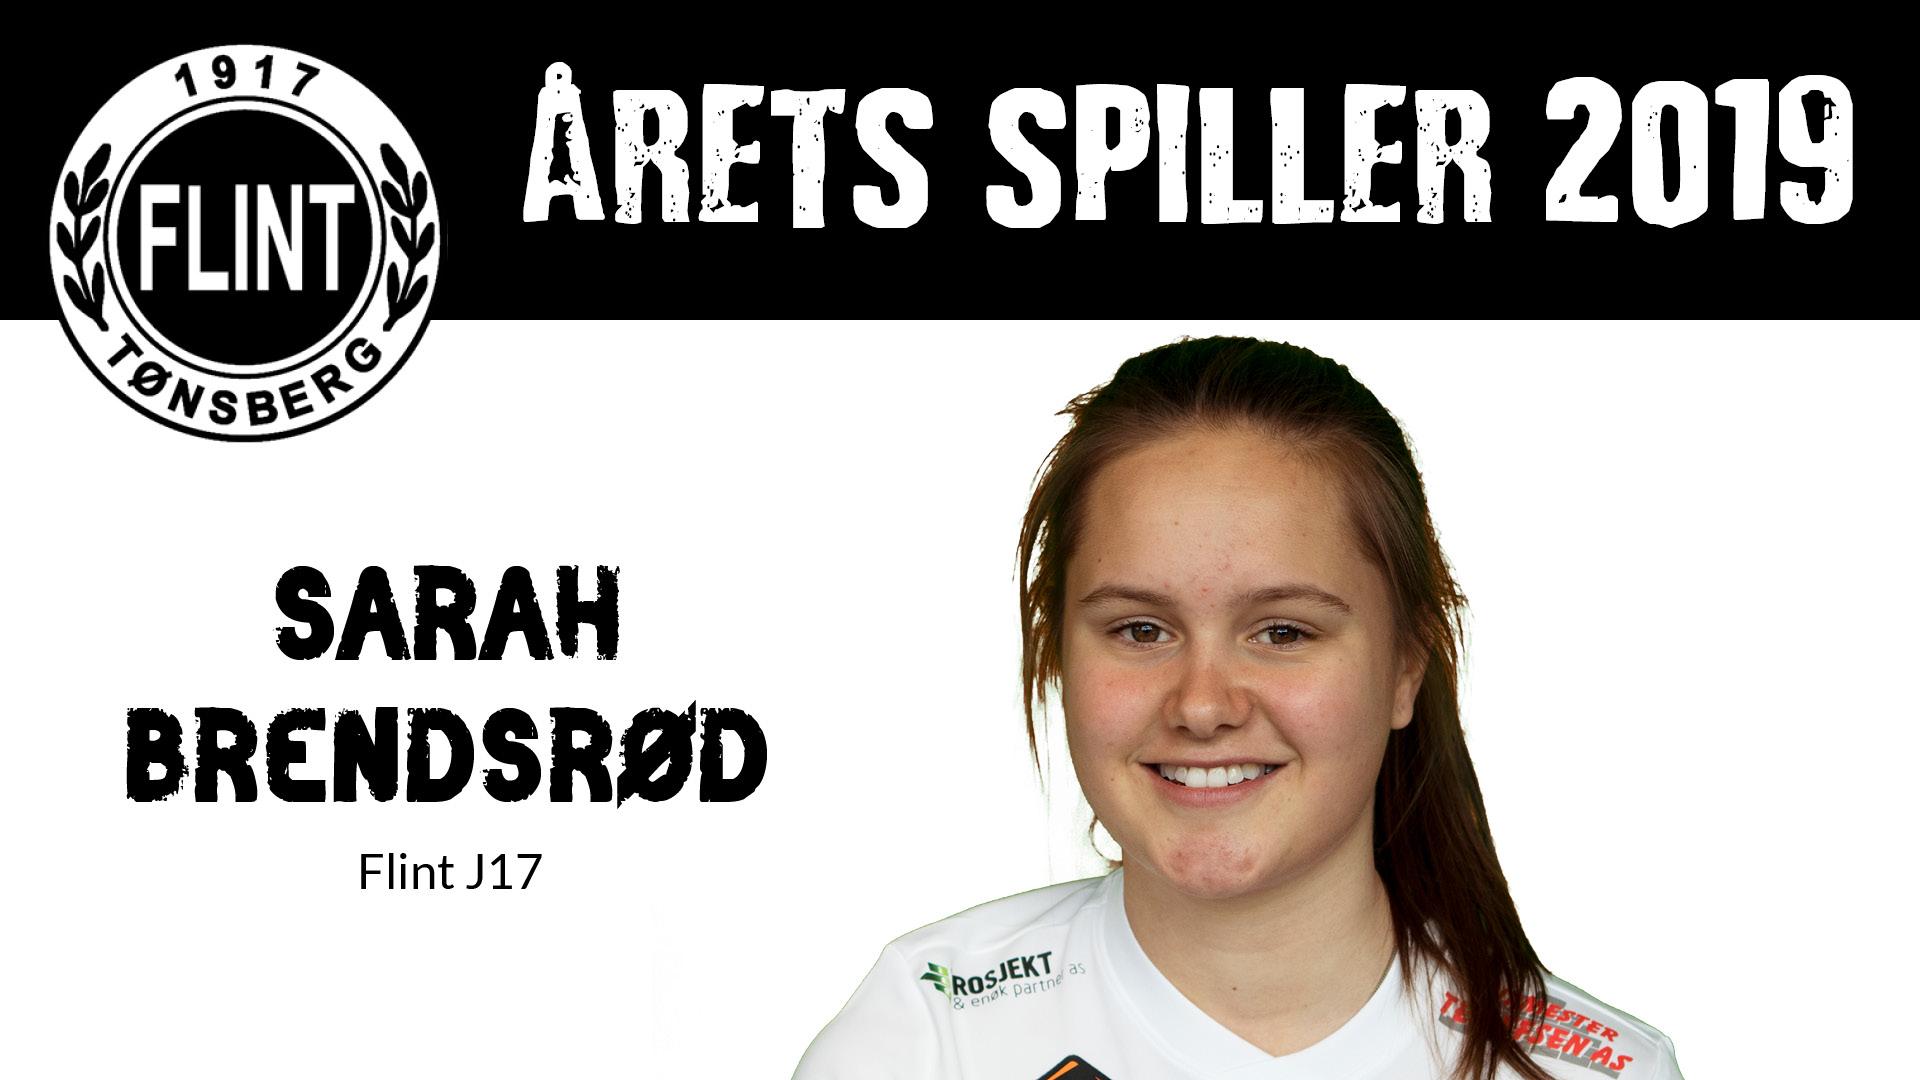 https://www.flintfotball.no/wp-content/uploads/2020/05/Årets-Spiller-damer.jpg